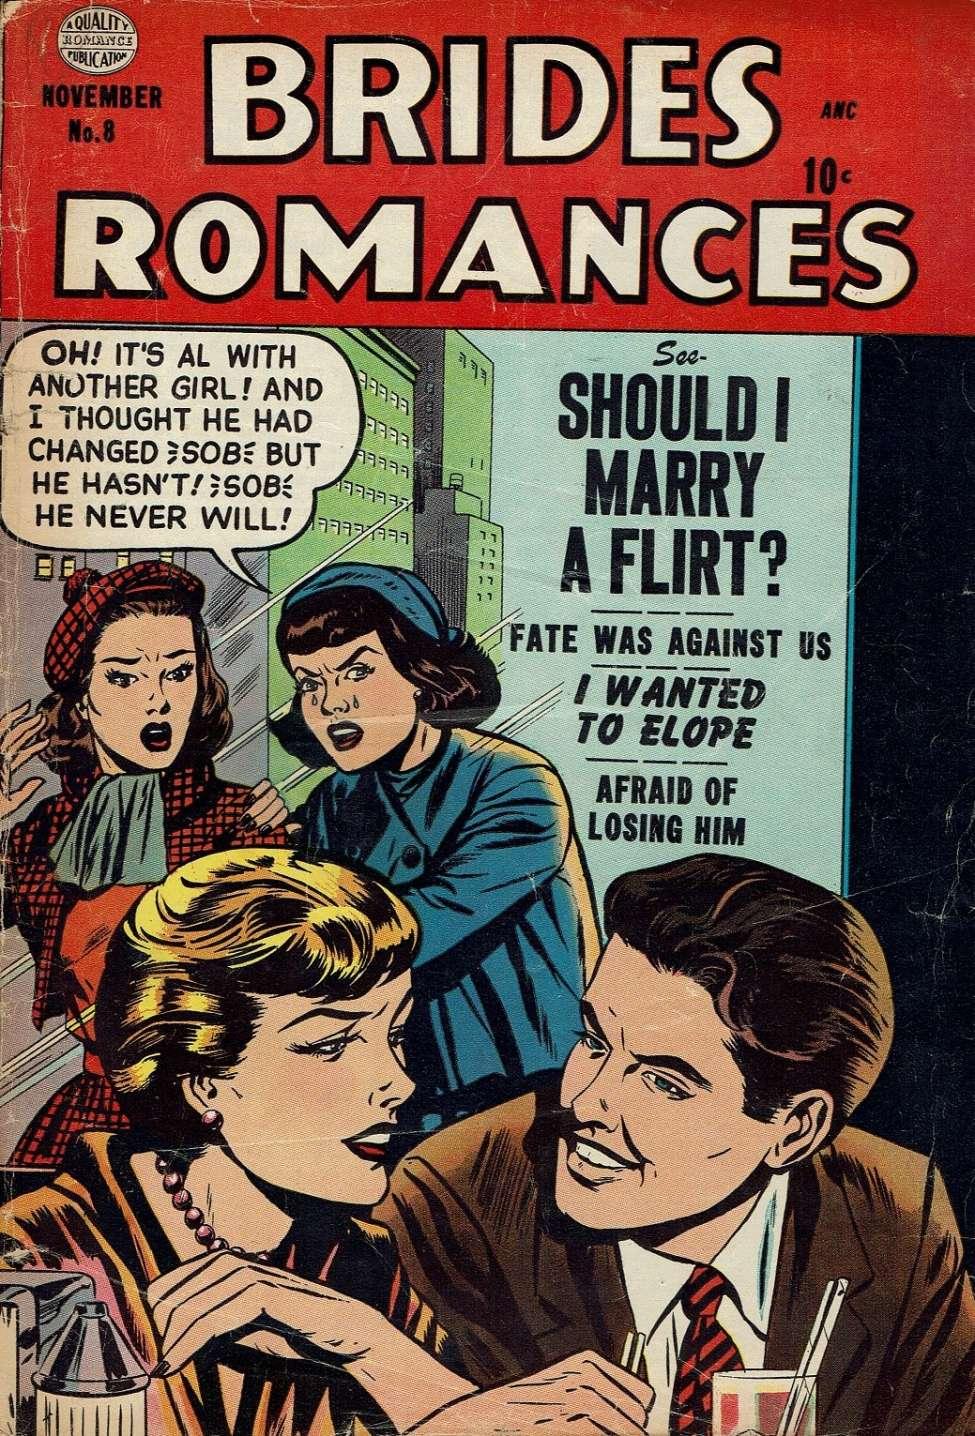 Comic Book Cover For Brides Romances #8